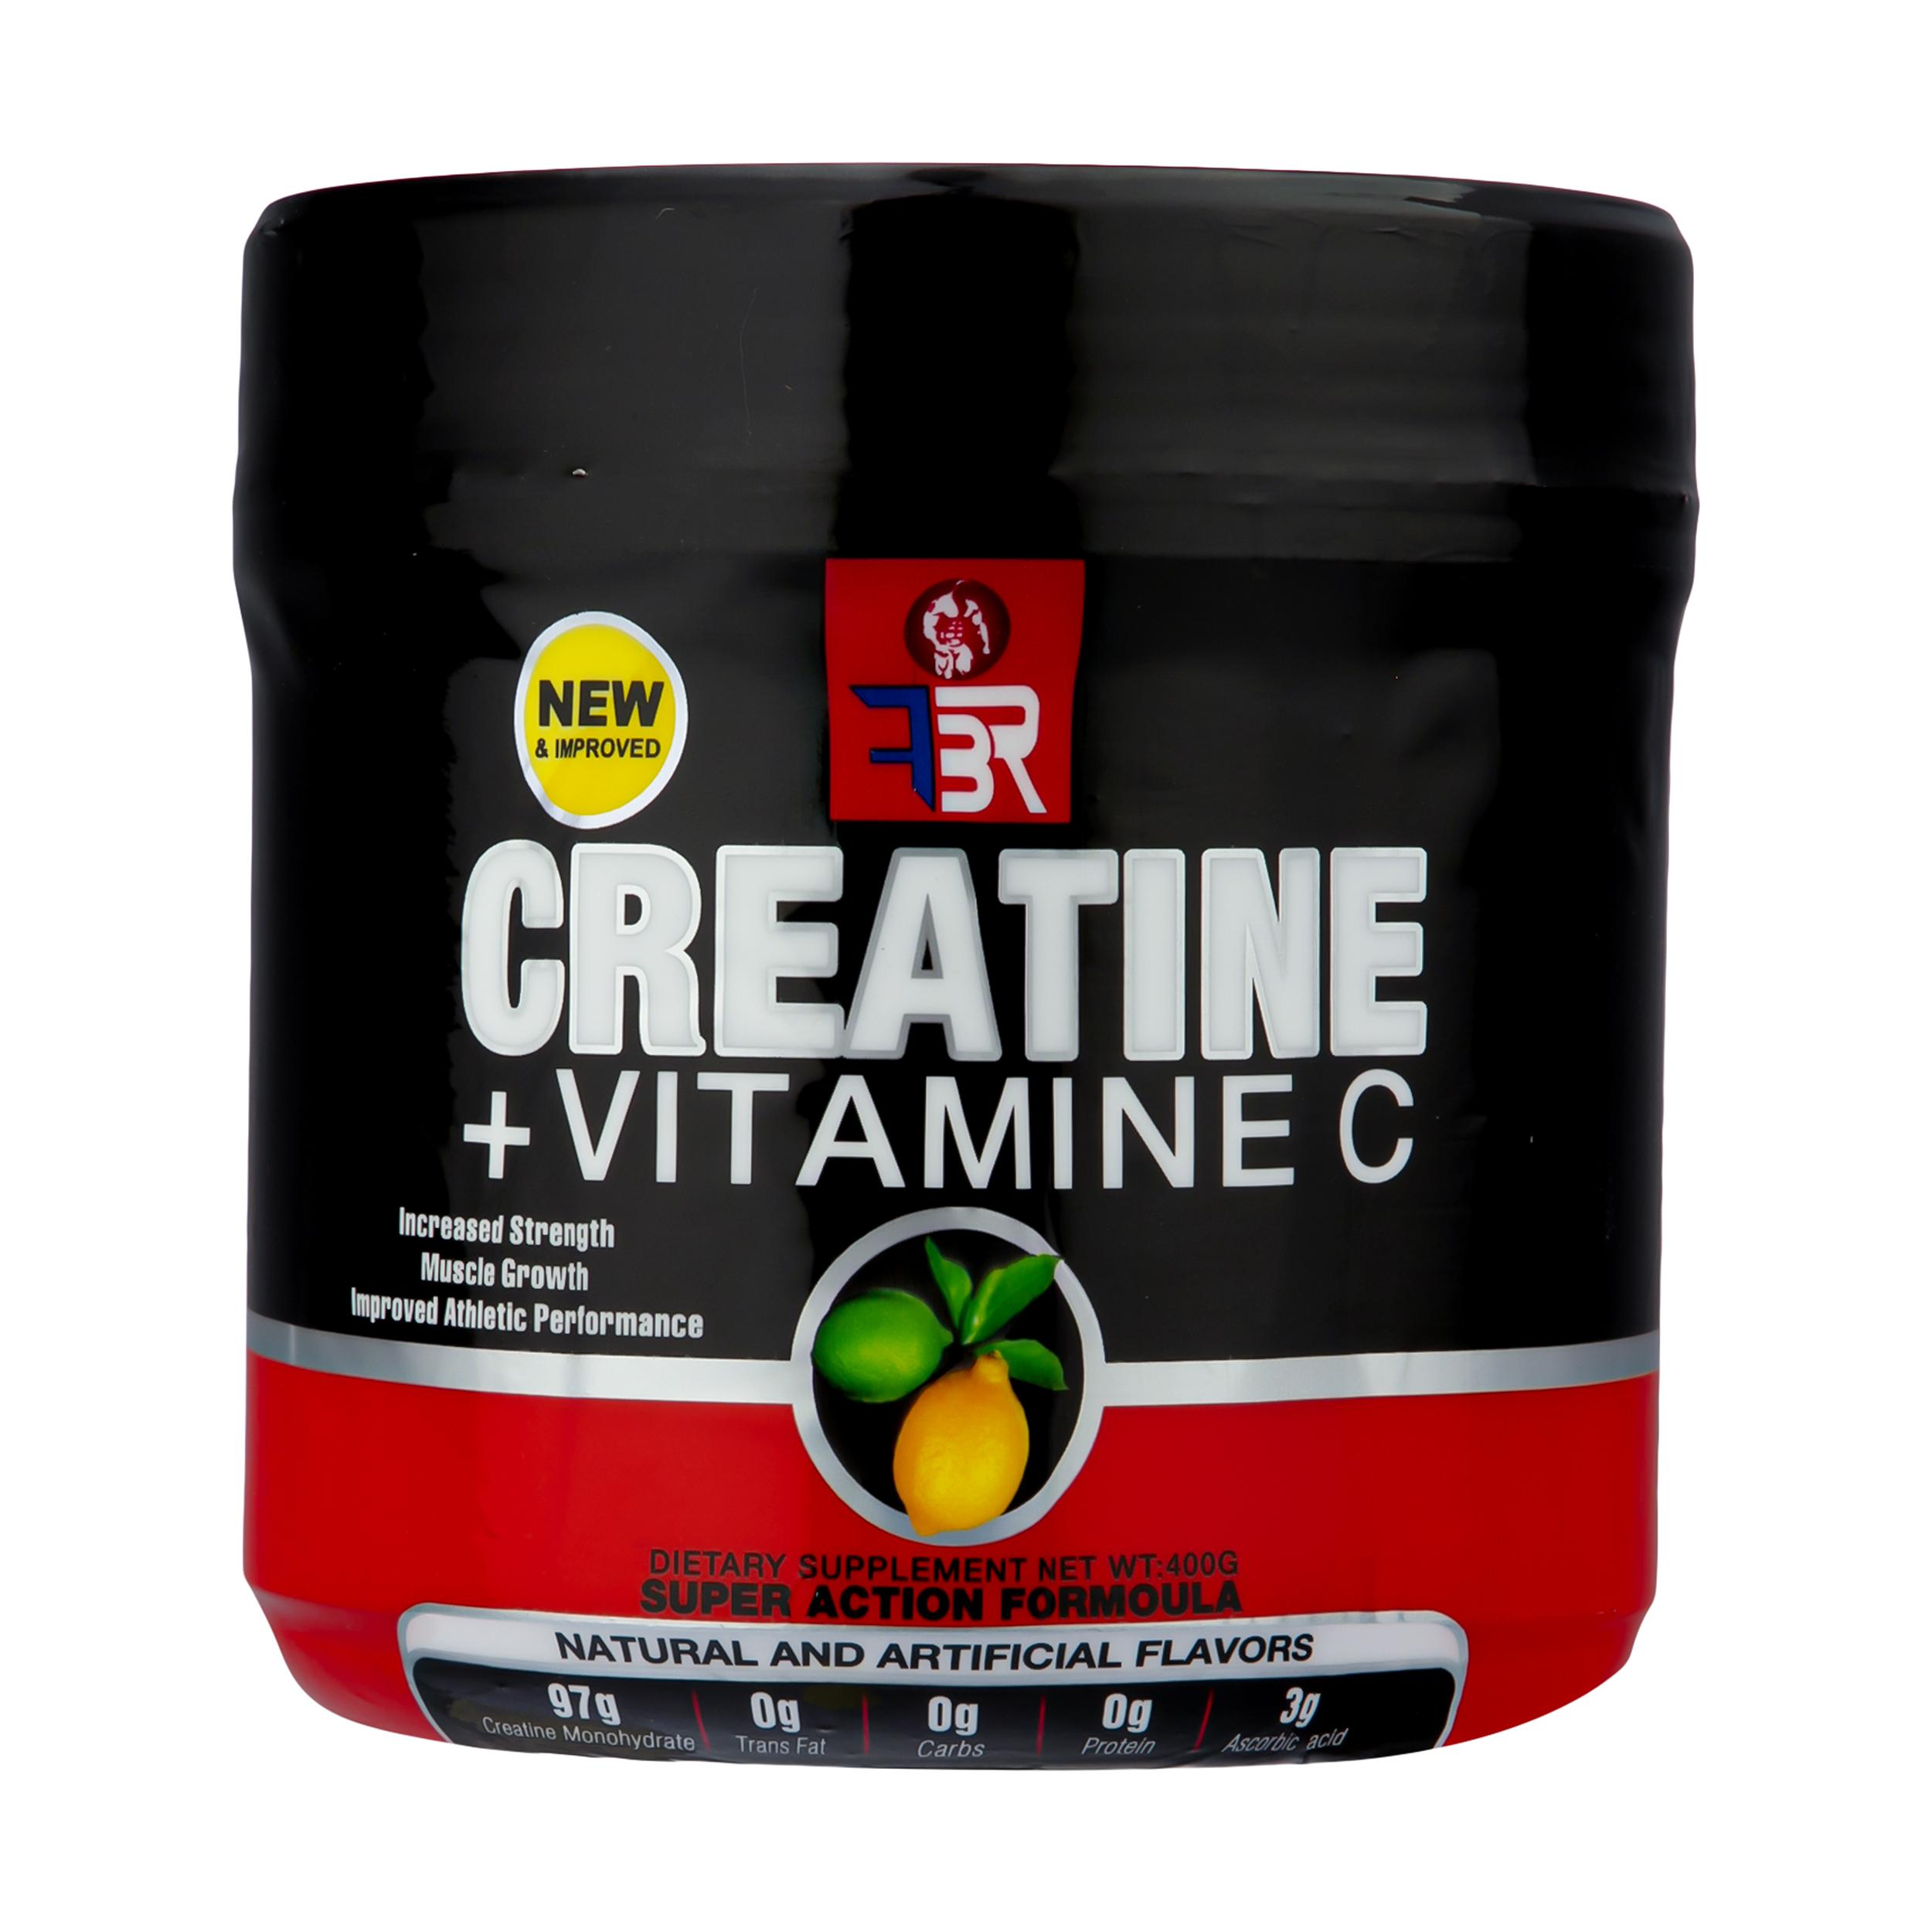 پودر کراتین+ویتامین C اف بی ار - 400 گرم